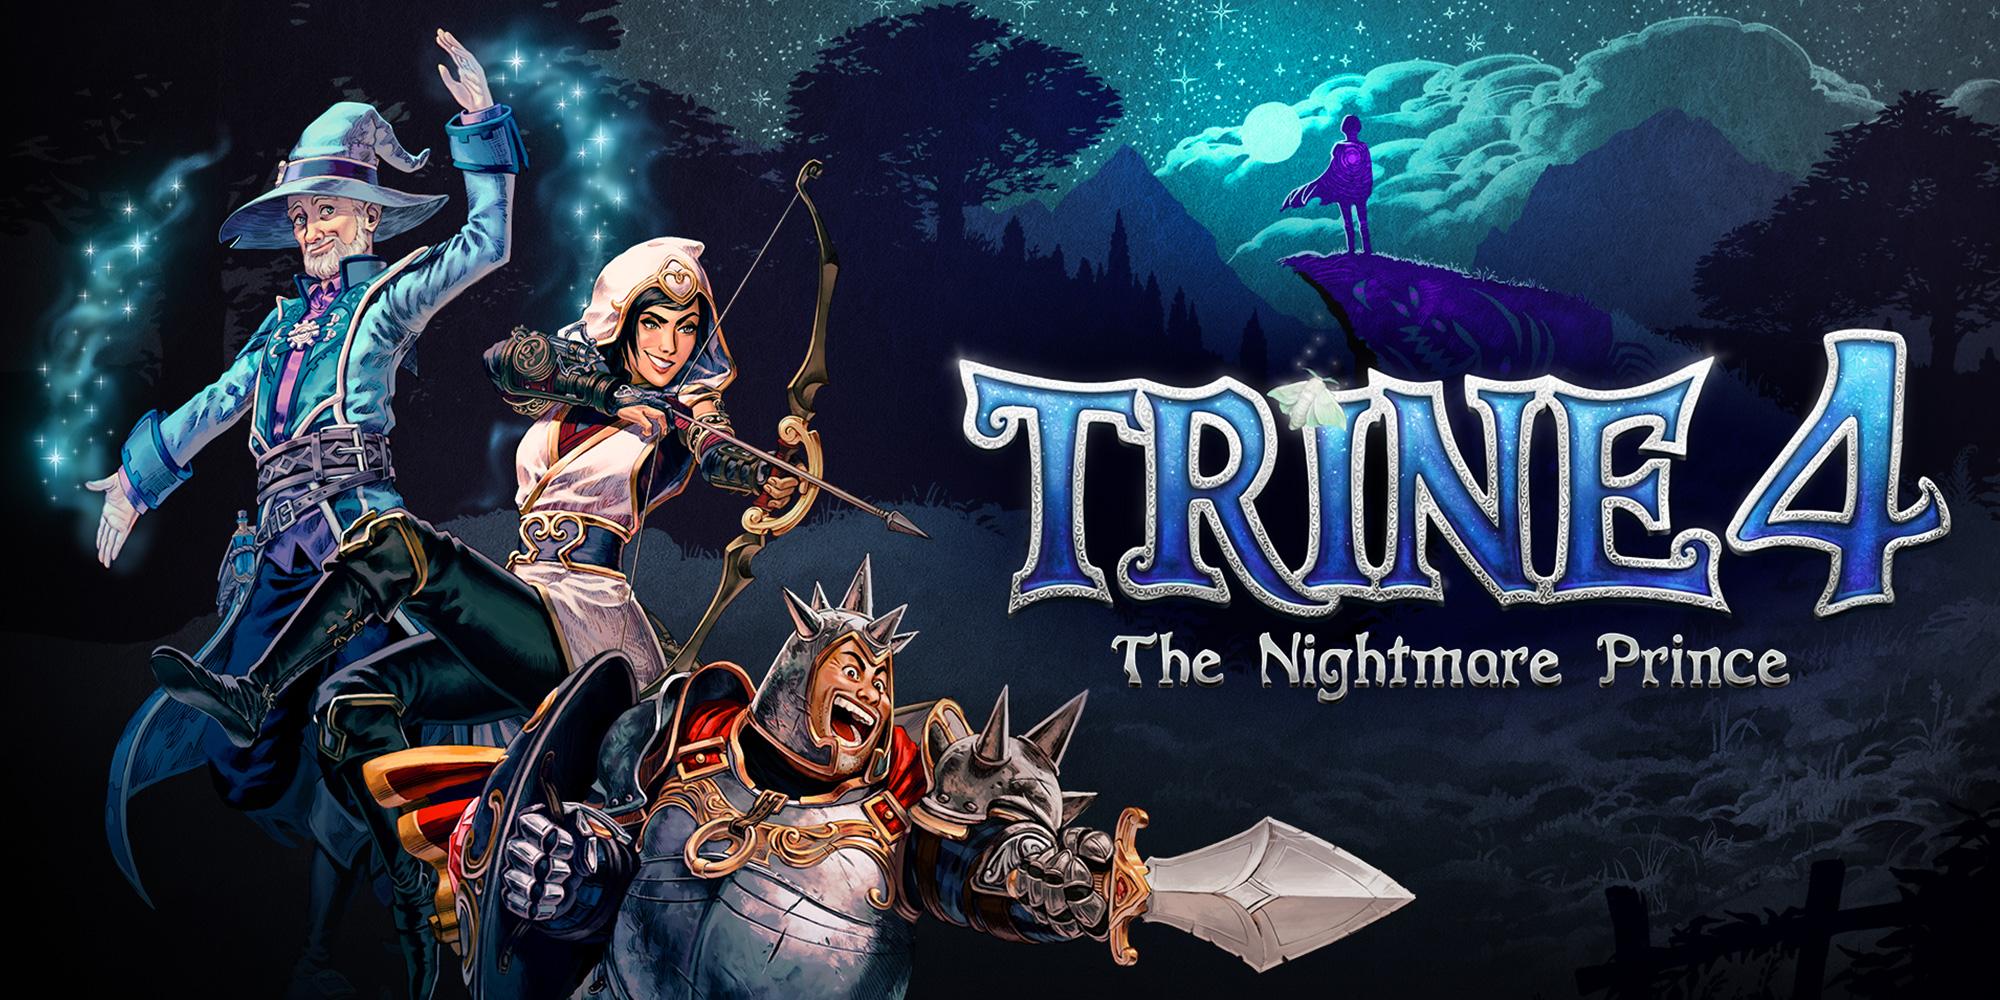 H2x1_NSwitch_Trine4TheNightmarePrince.jpg